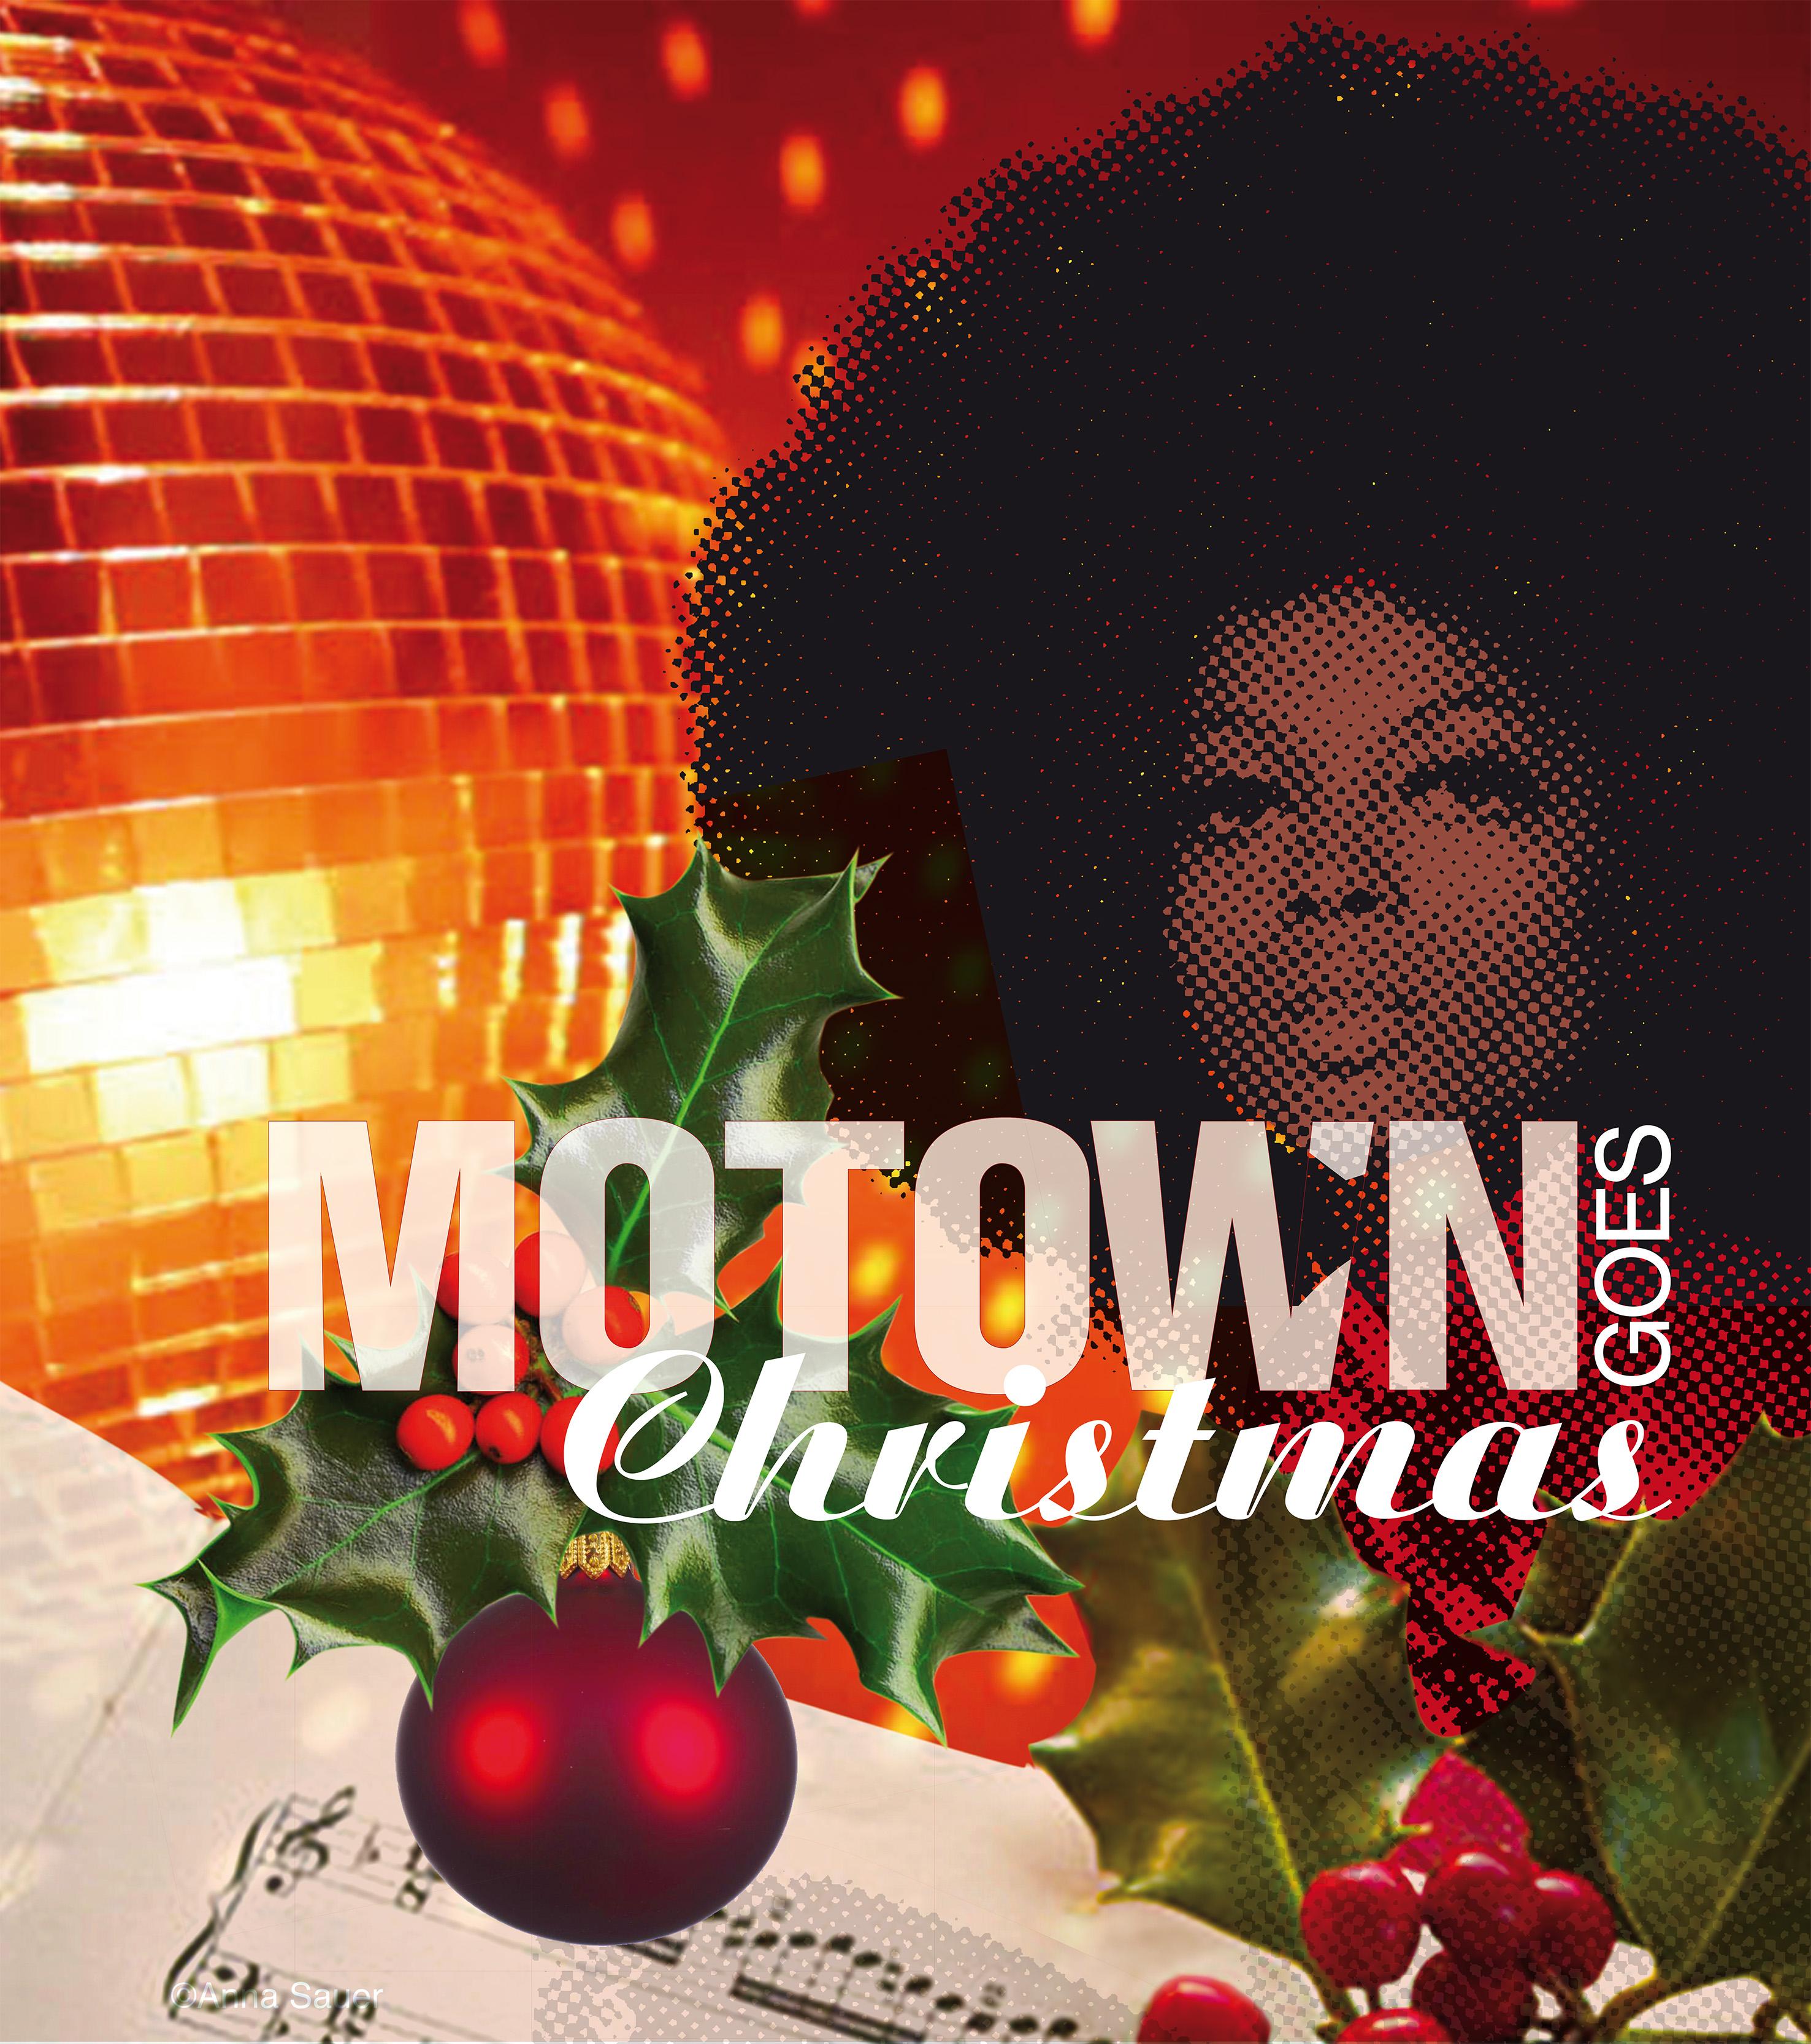 Bild: Motown Goes Christmas ©Konzertdirektion Landgraf